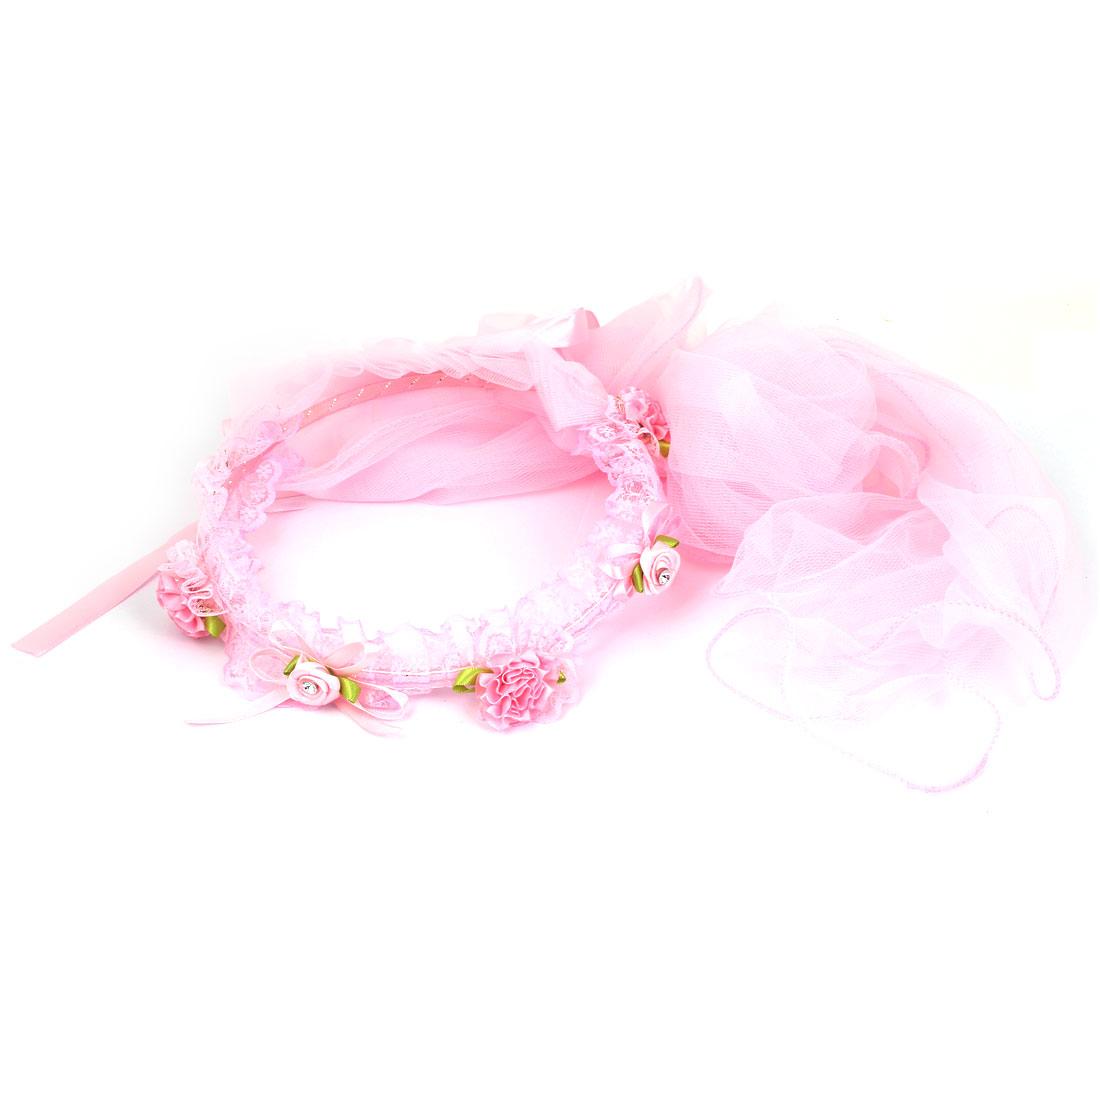 Flower Decor Women Wedding Festival Hair Band Crown Garland Wreath Veil Pink